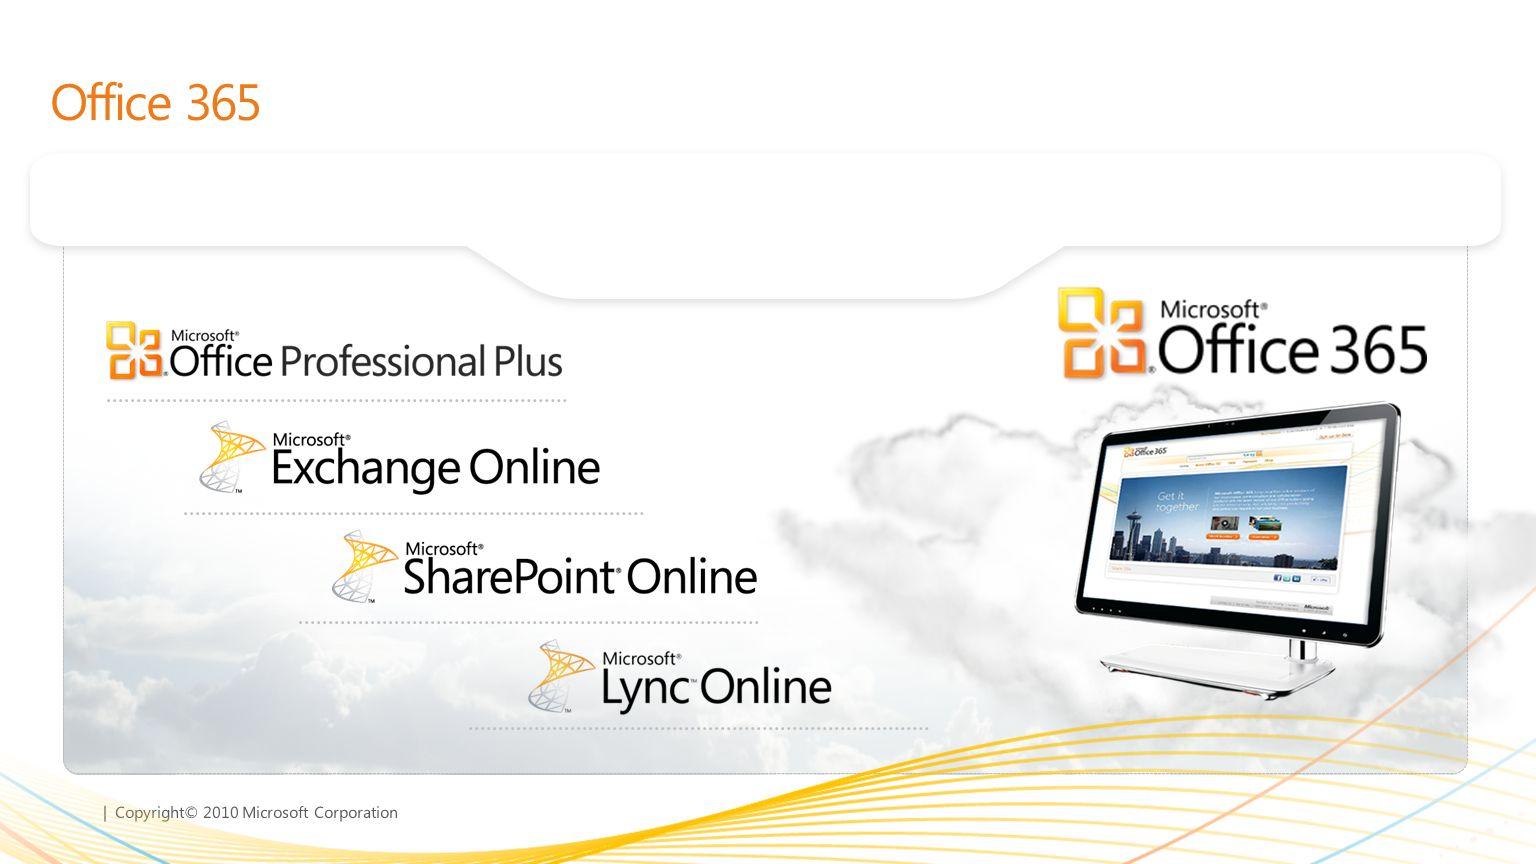 | Copyright© 2010 Microsoft Corporation Office 365